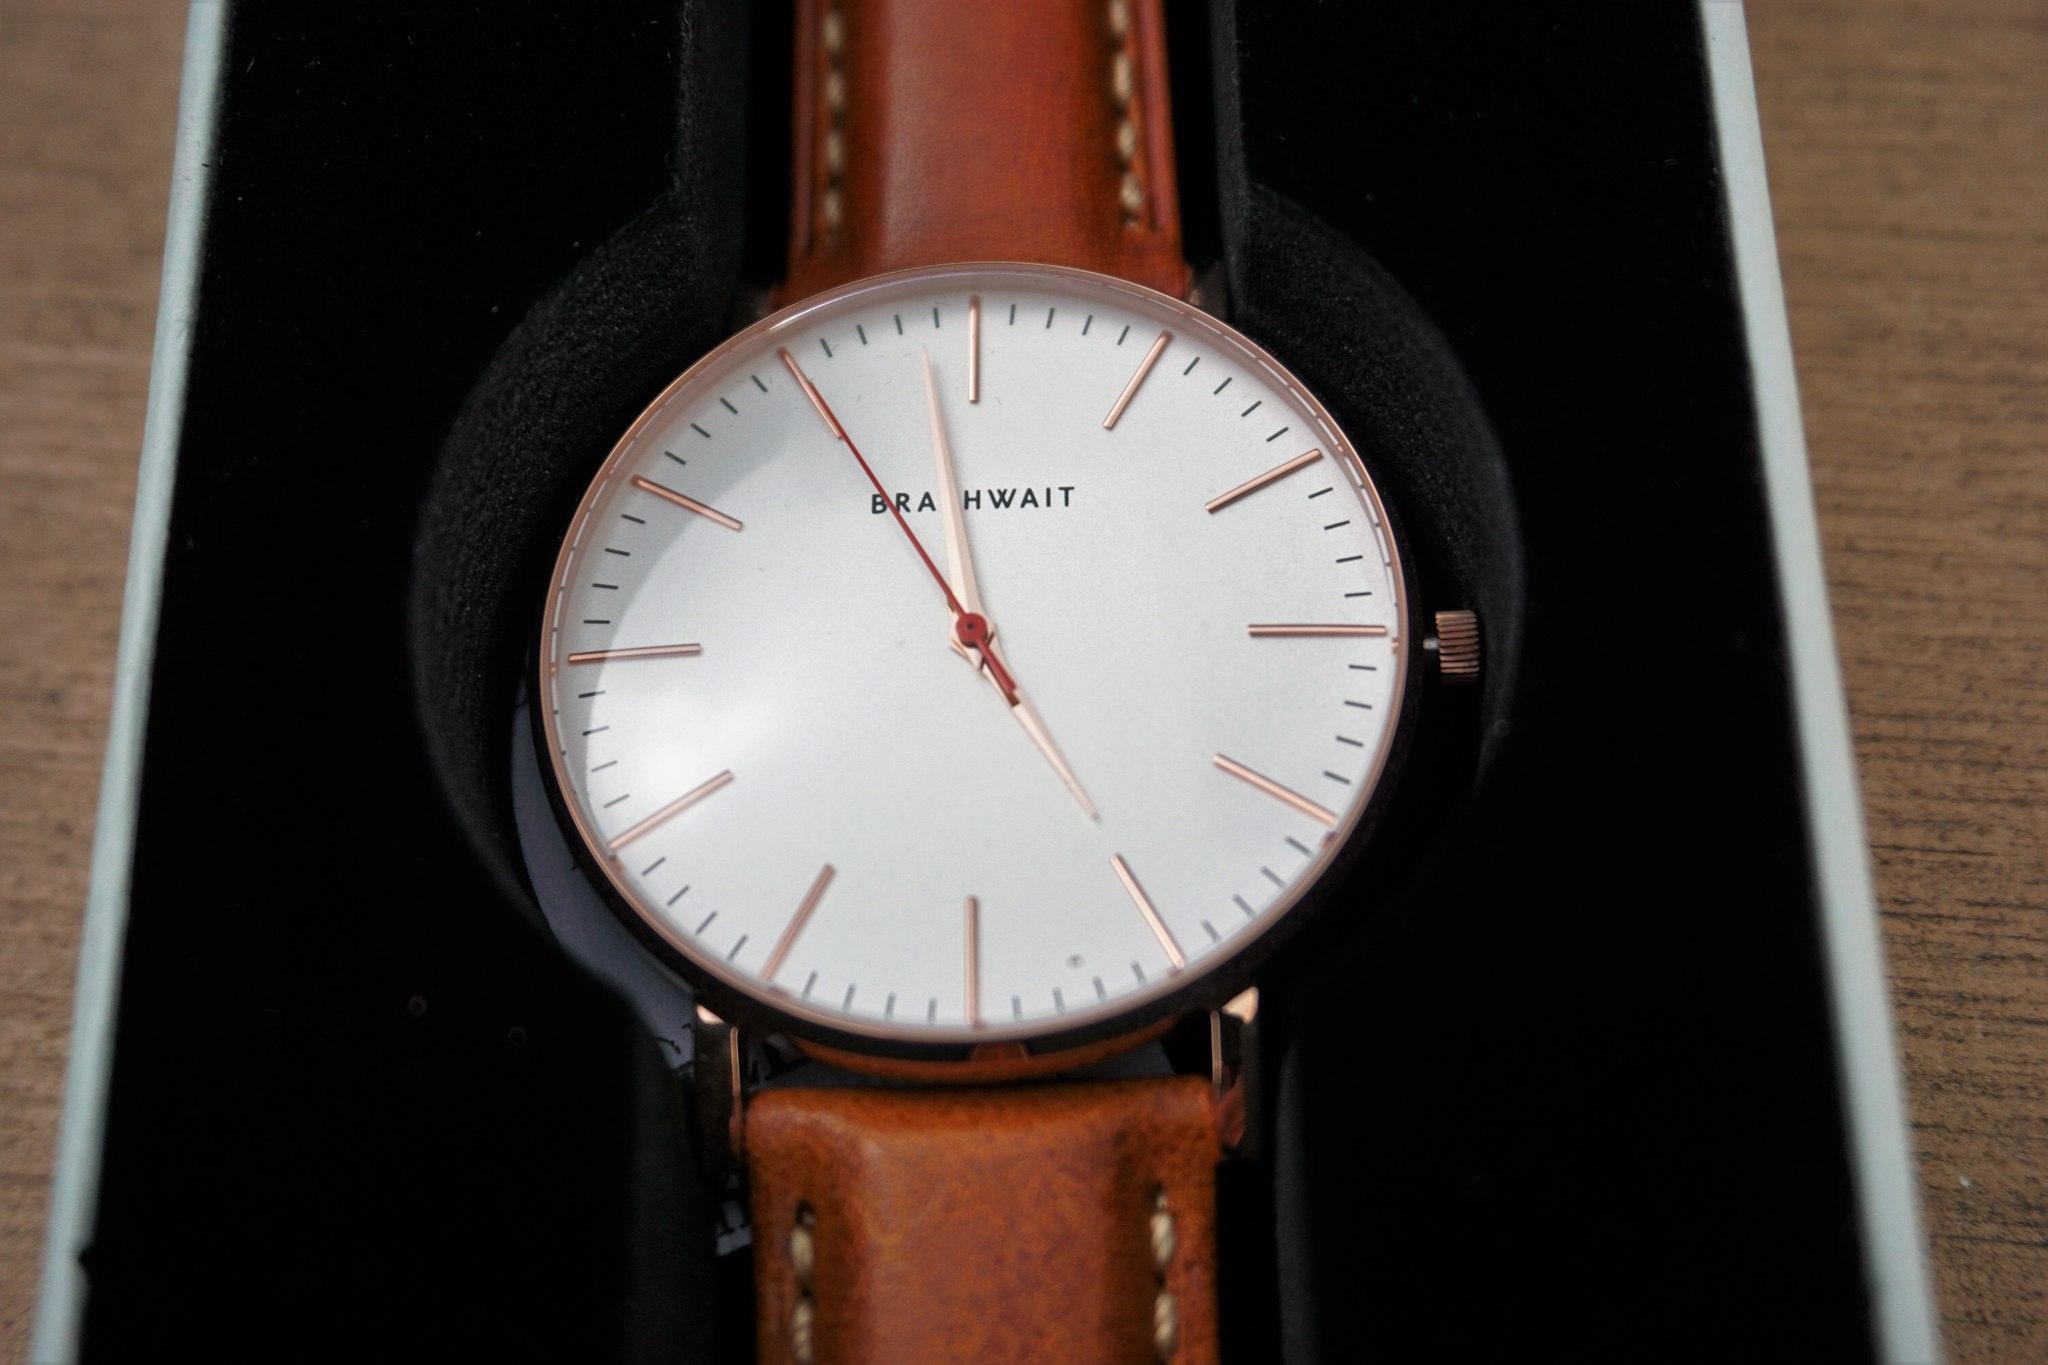 brathwait-classic-slim-mens-watch-3